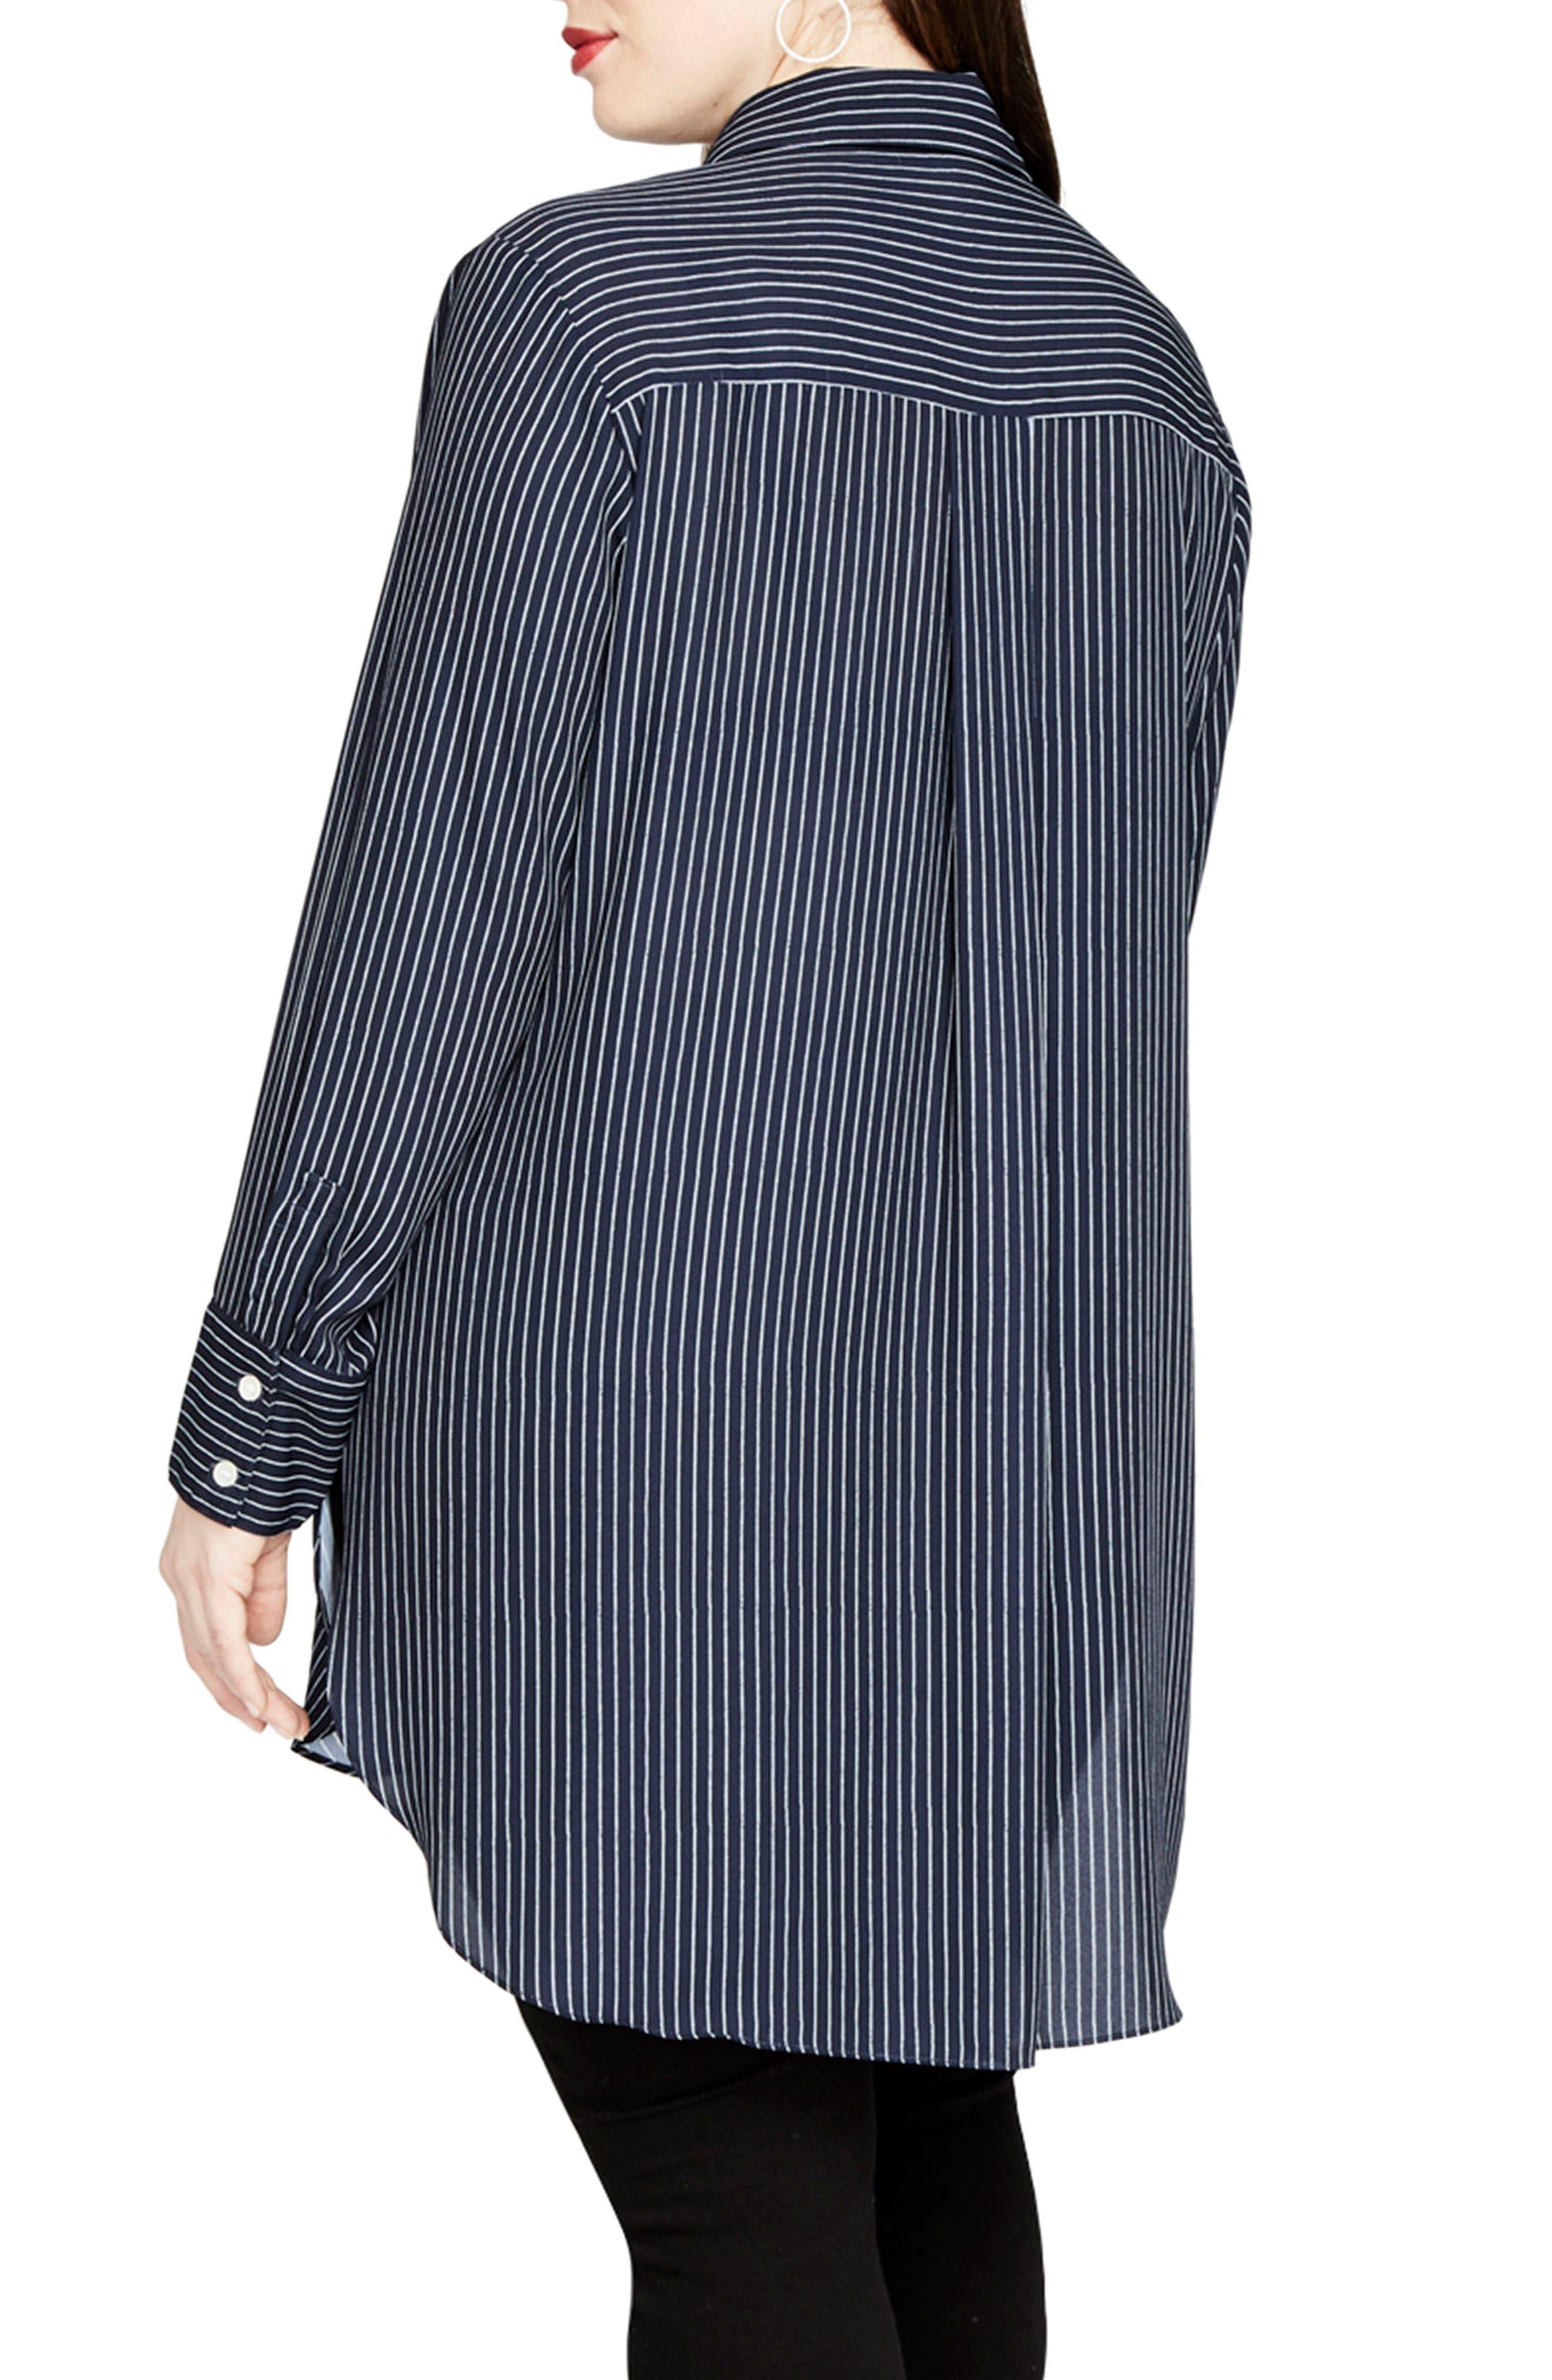 High/Low Pinstripe Shirt,                             Alternate thumbnail 2, color,                             411